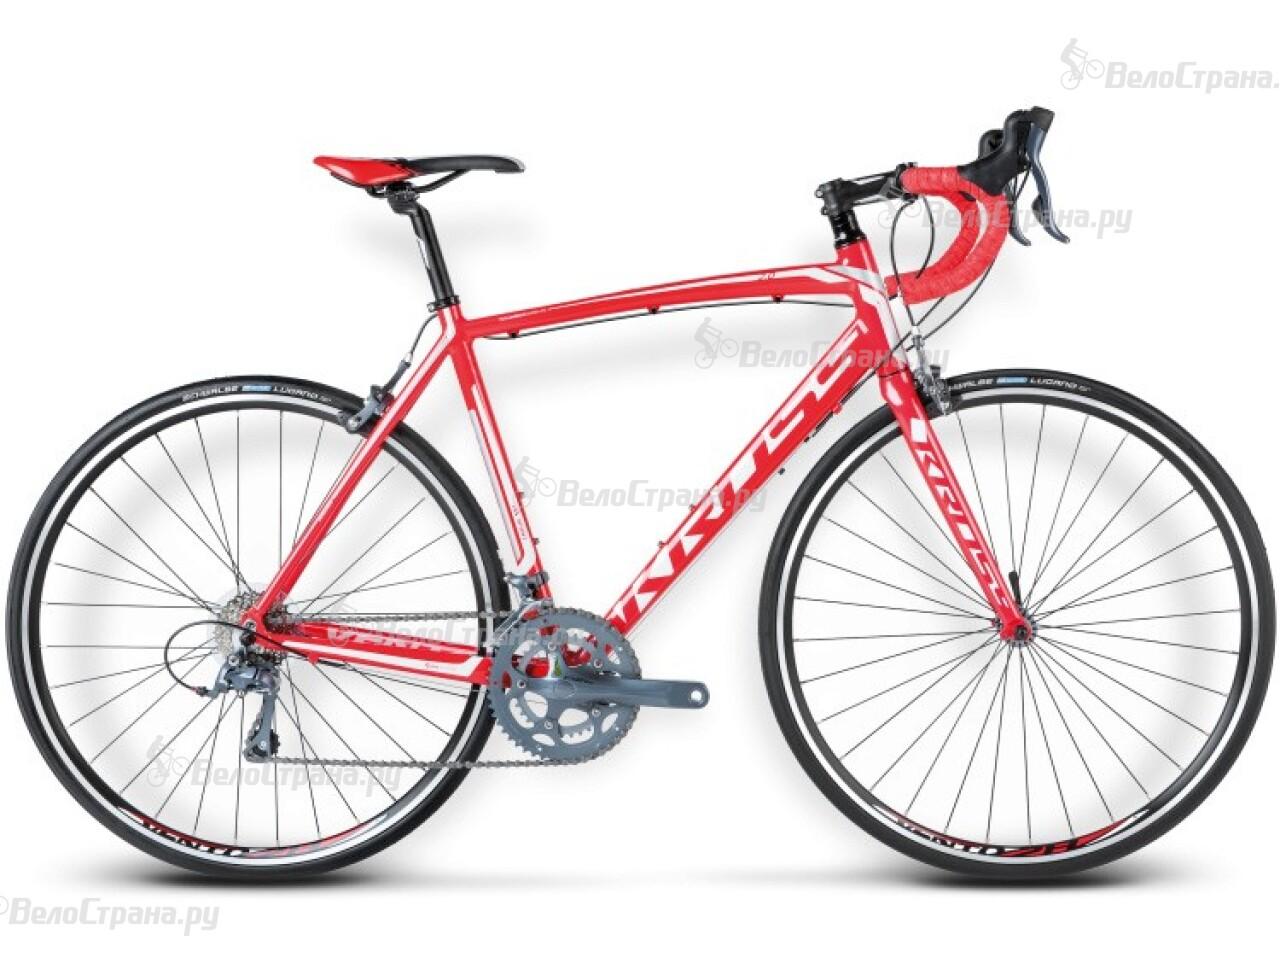 Велосипед Kross VENTO 2.0 (2016) vento cord 8мм